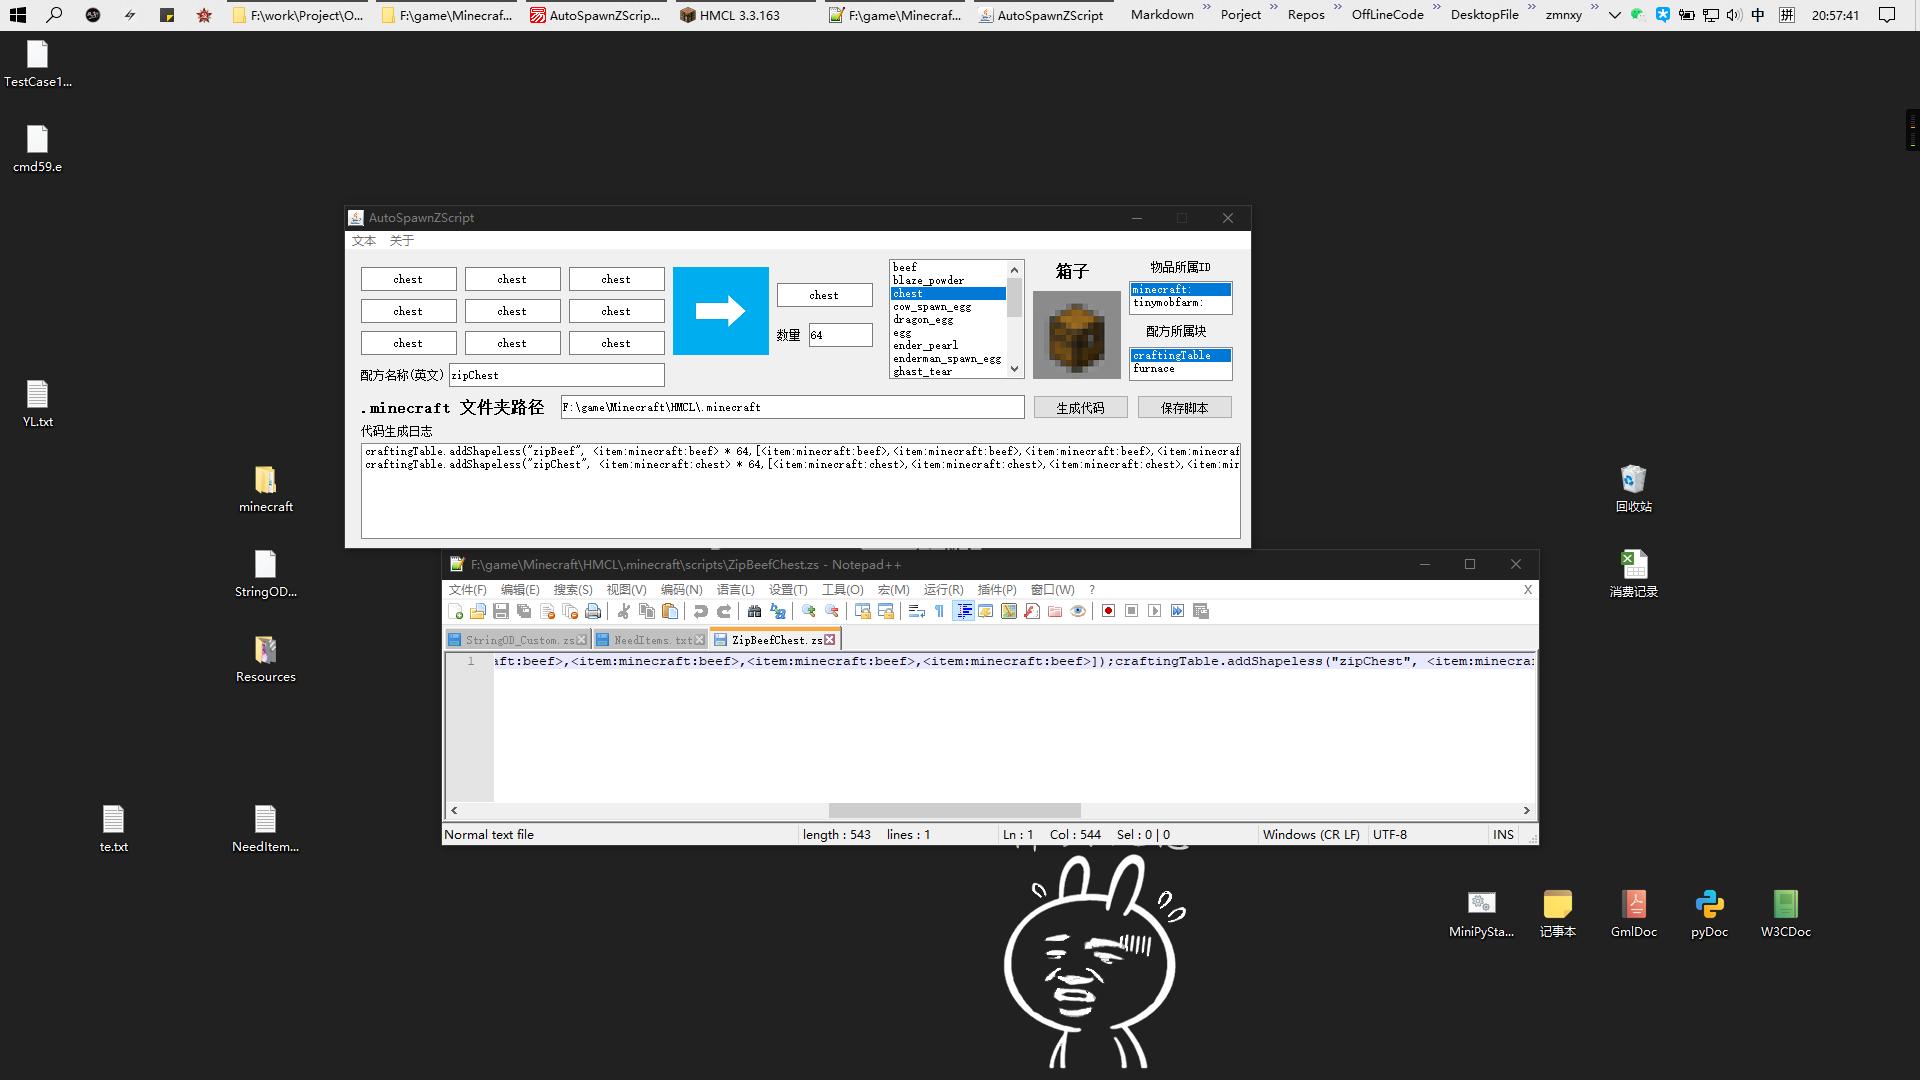 AutoSpawnZScript - v0.3